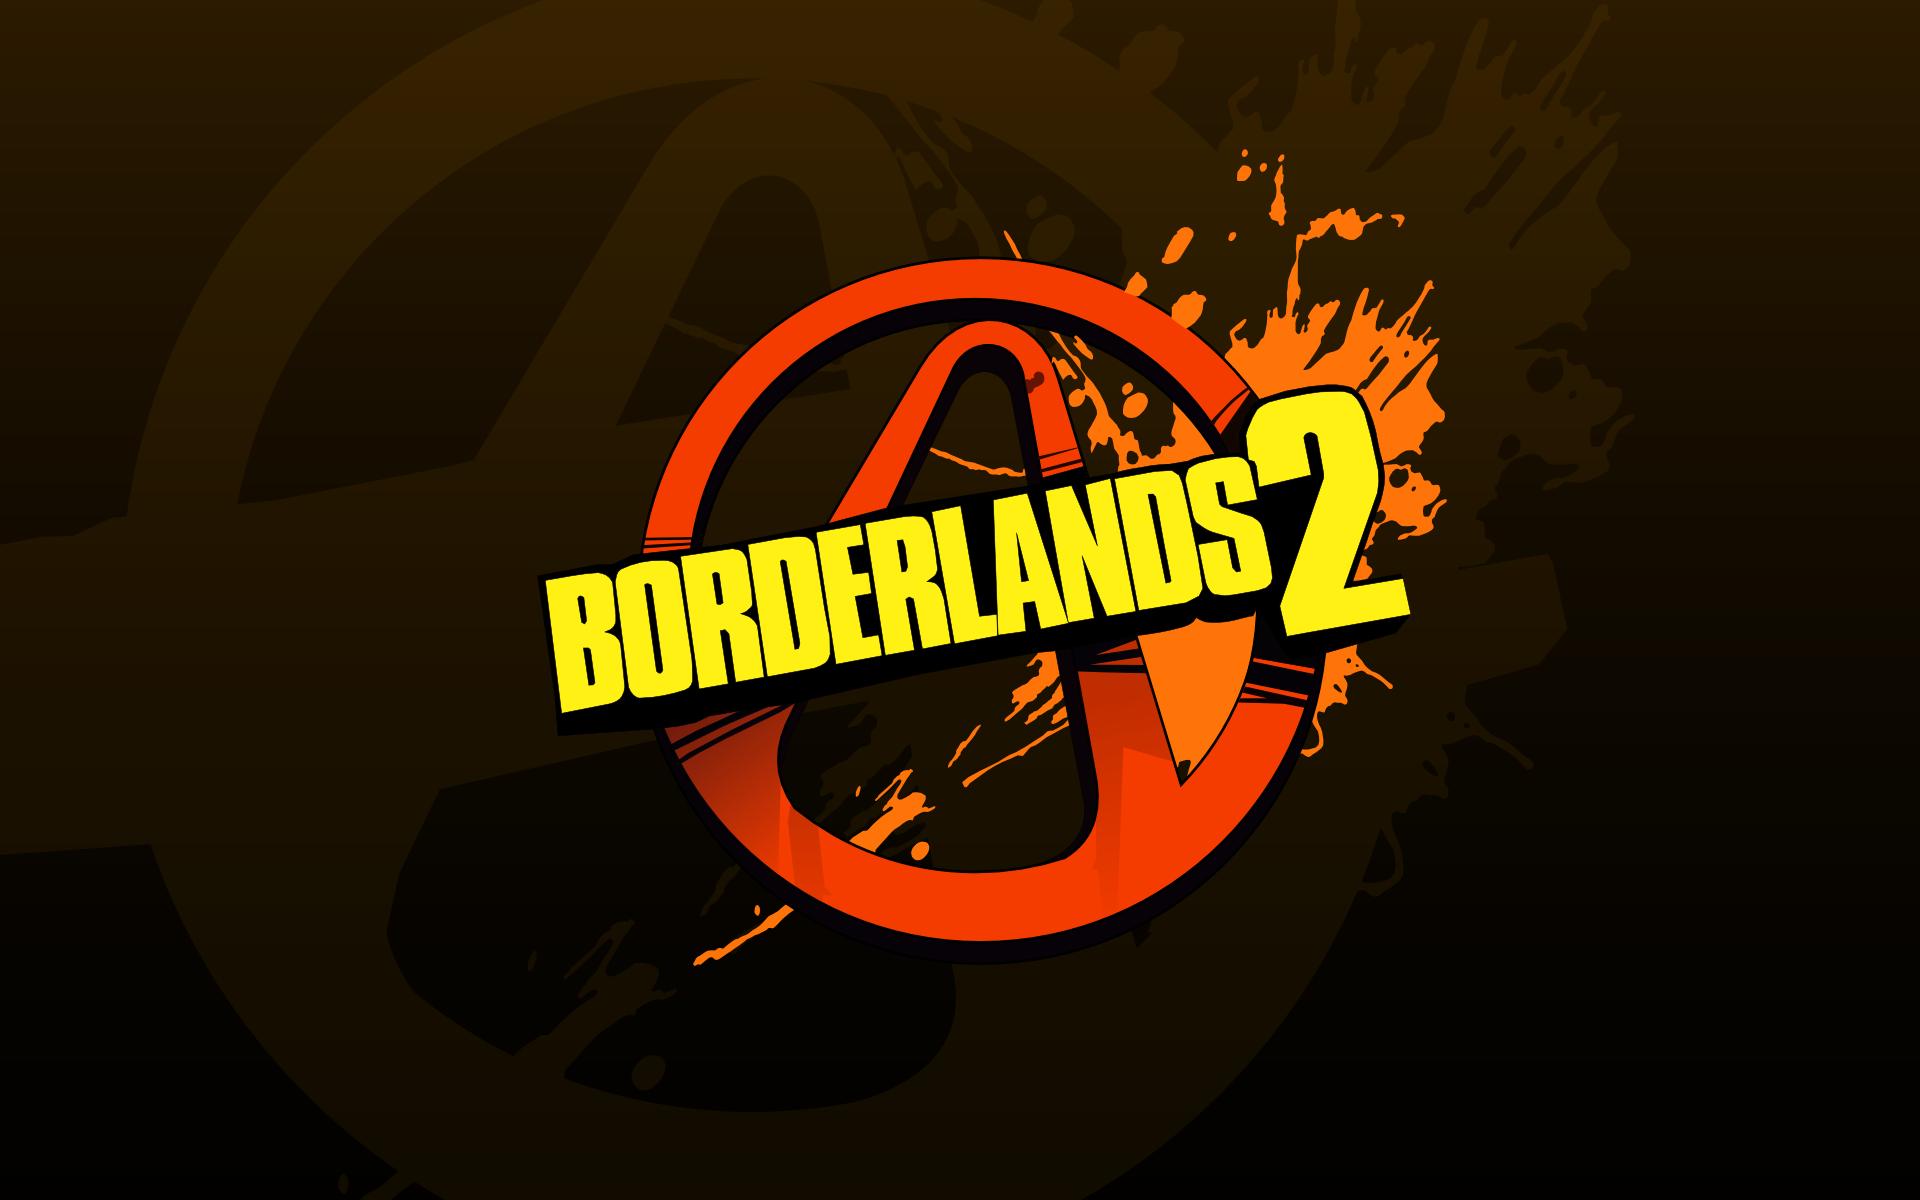 borderlands 2: logo hd wallpaper | wallpapers.gg